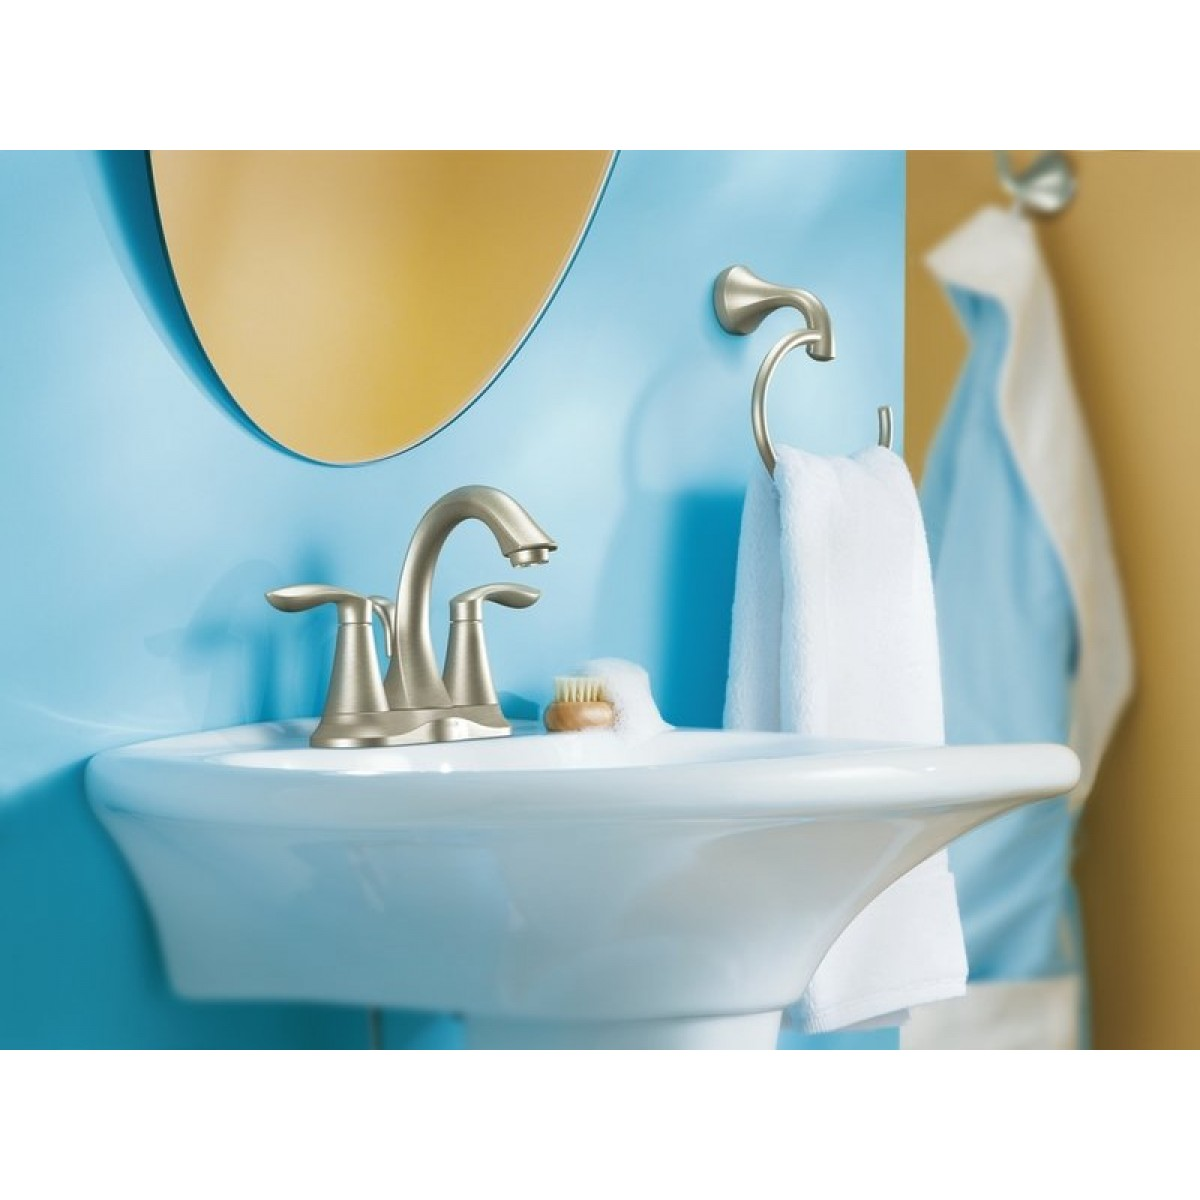 Moen Eva Centerset Lead Free 3 Hole High Arc Bathroom Faucet Brushed ...